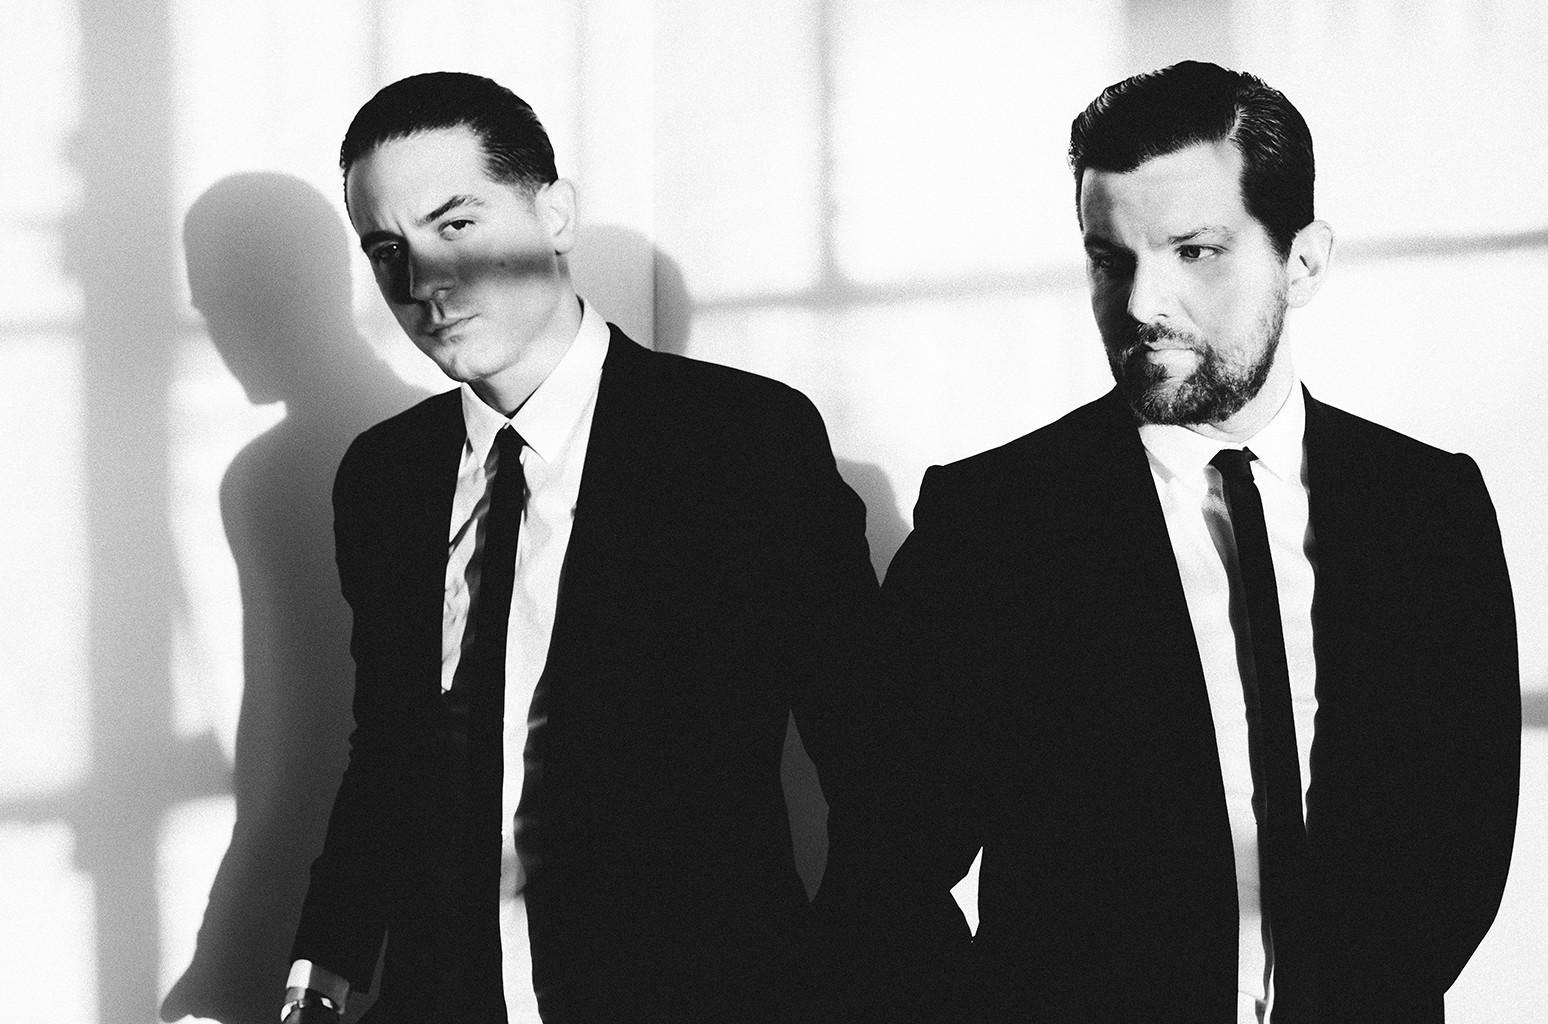 G-Eazy and Dillon Francis